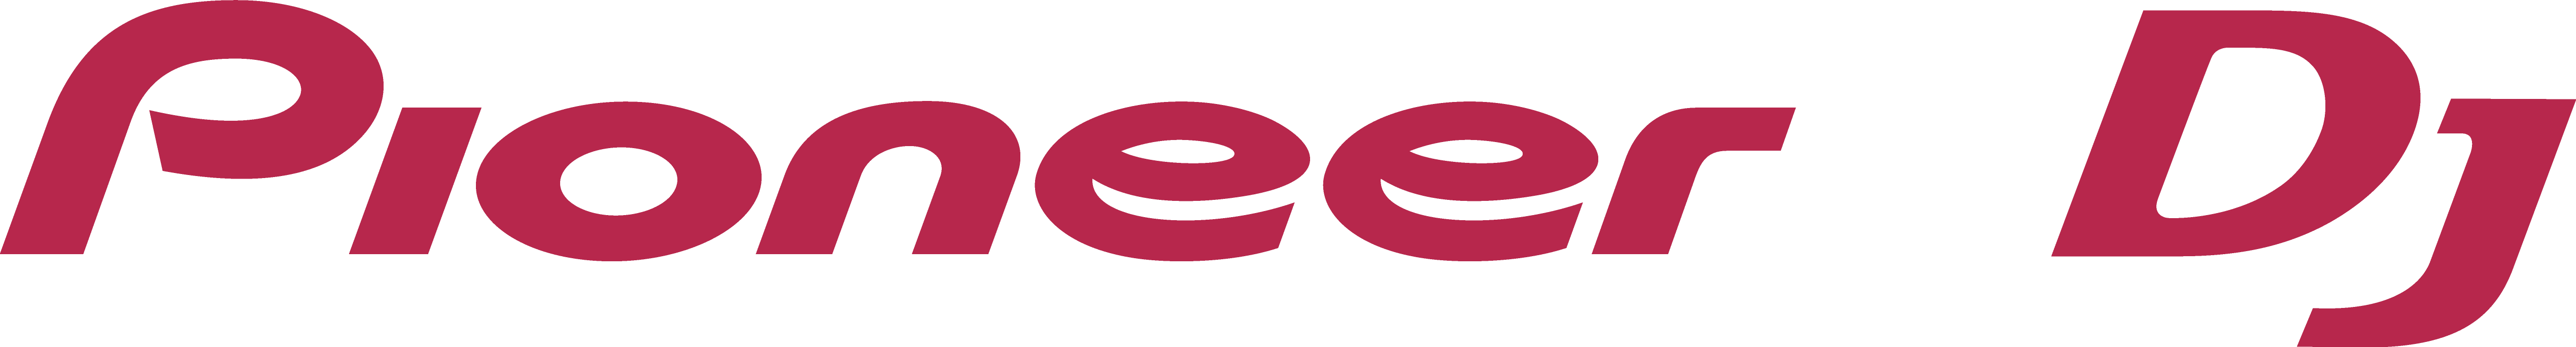 pioneer dj logo [Converted]